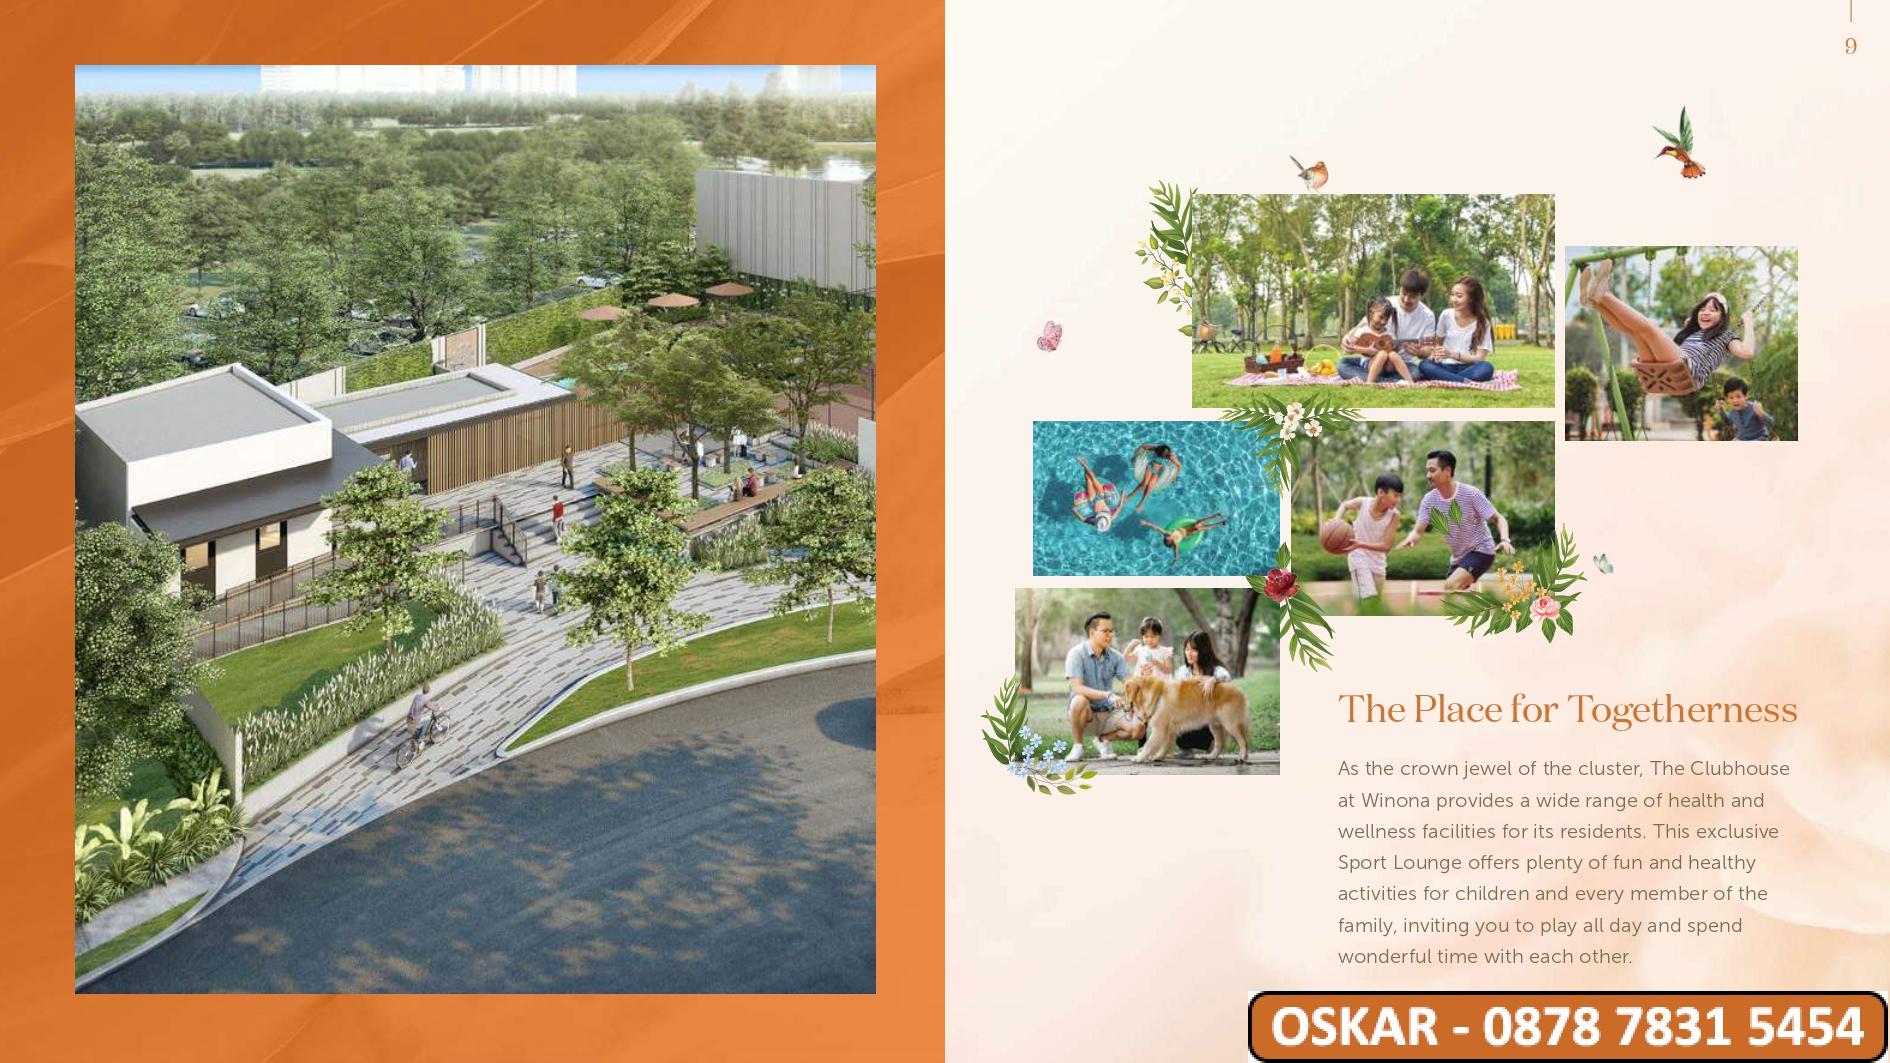 E-Brochure Alam Sutera Winona - Oskar_page-0009